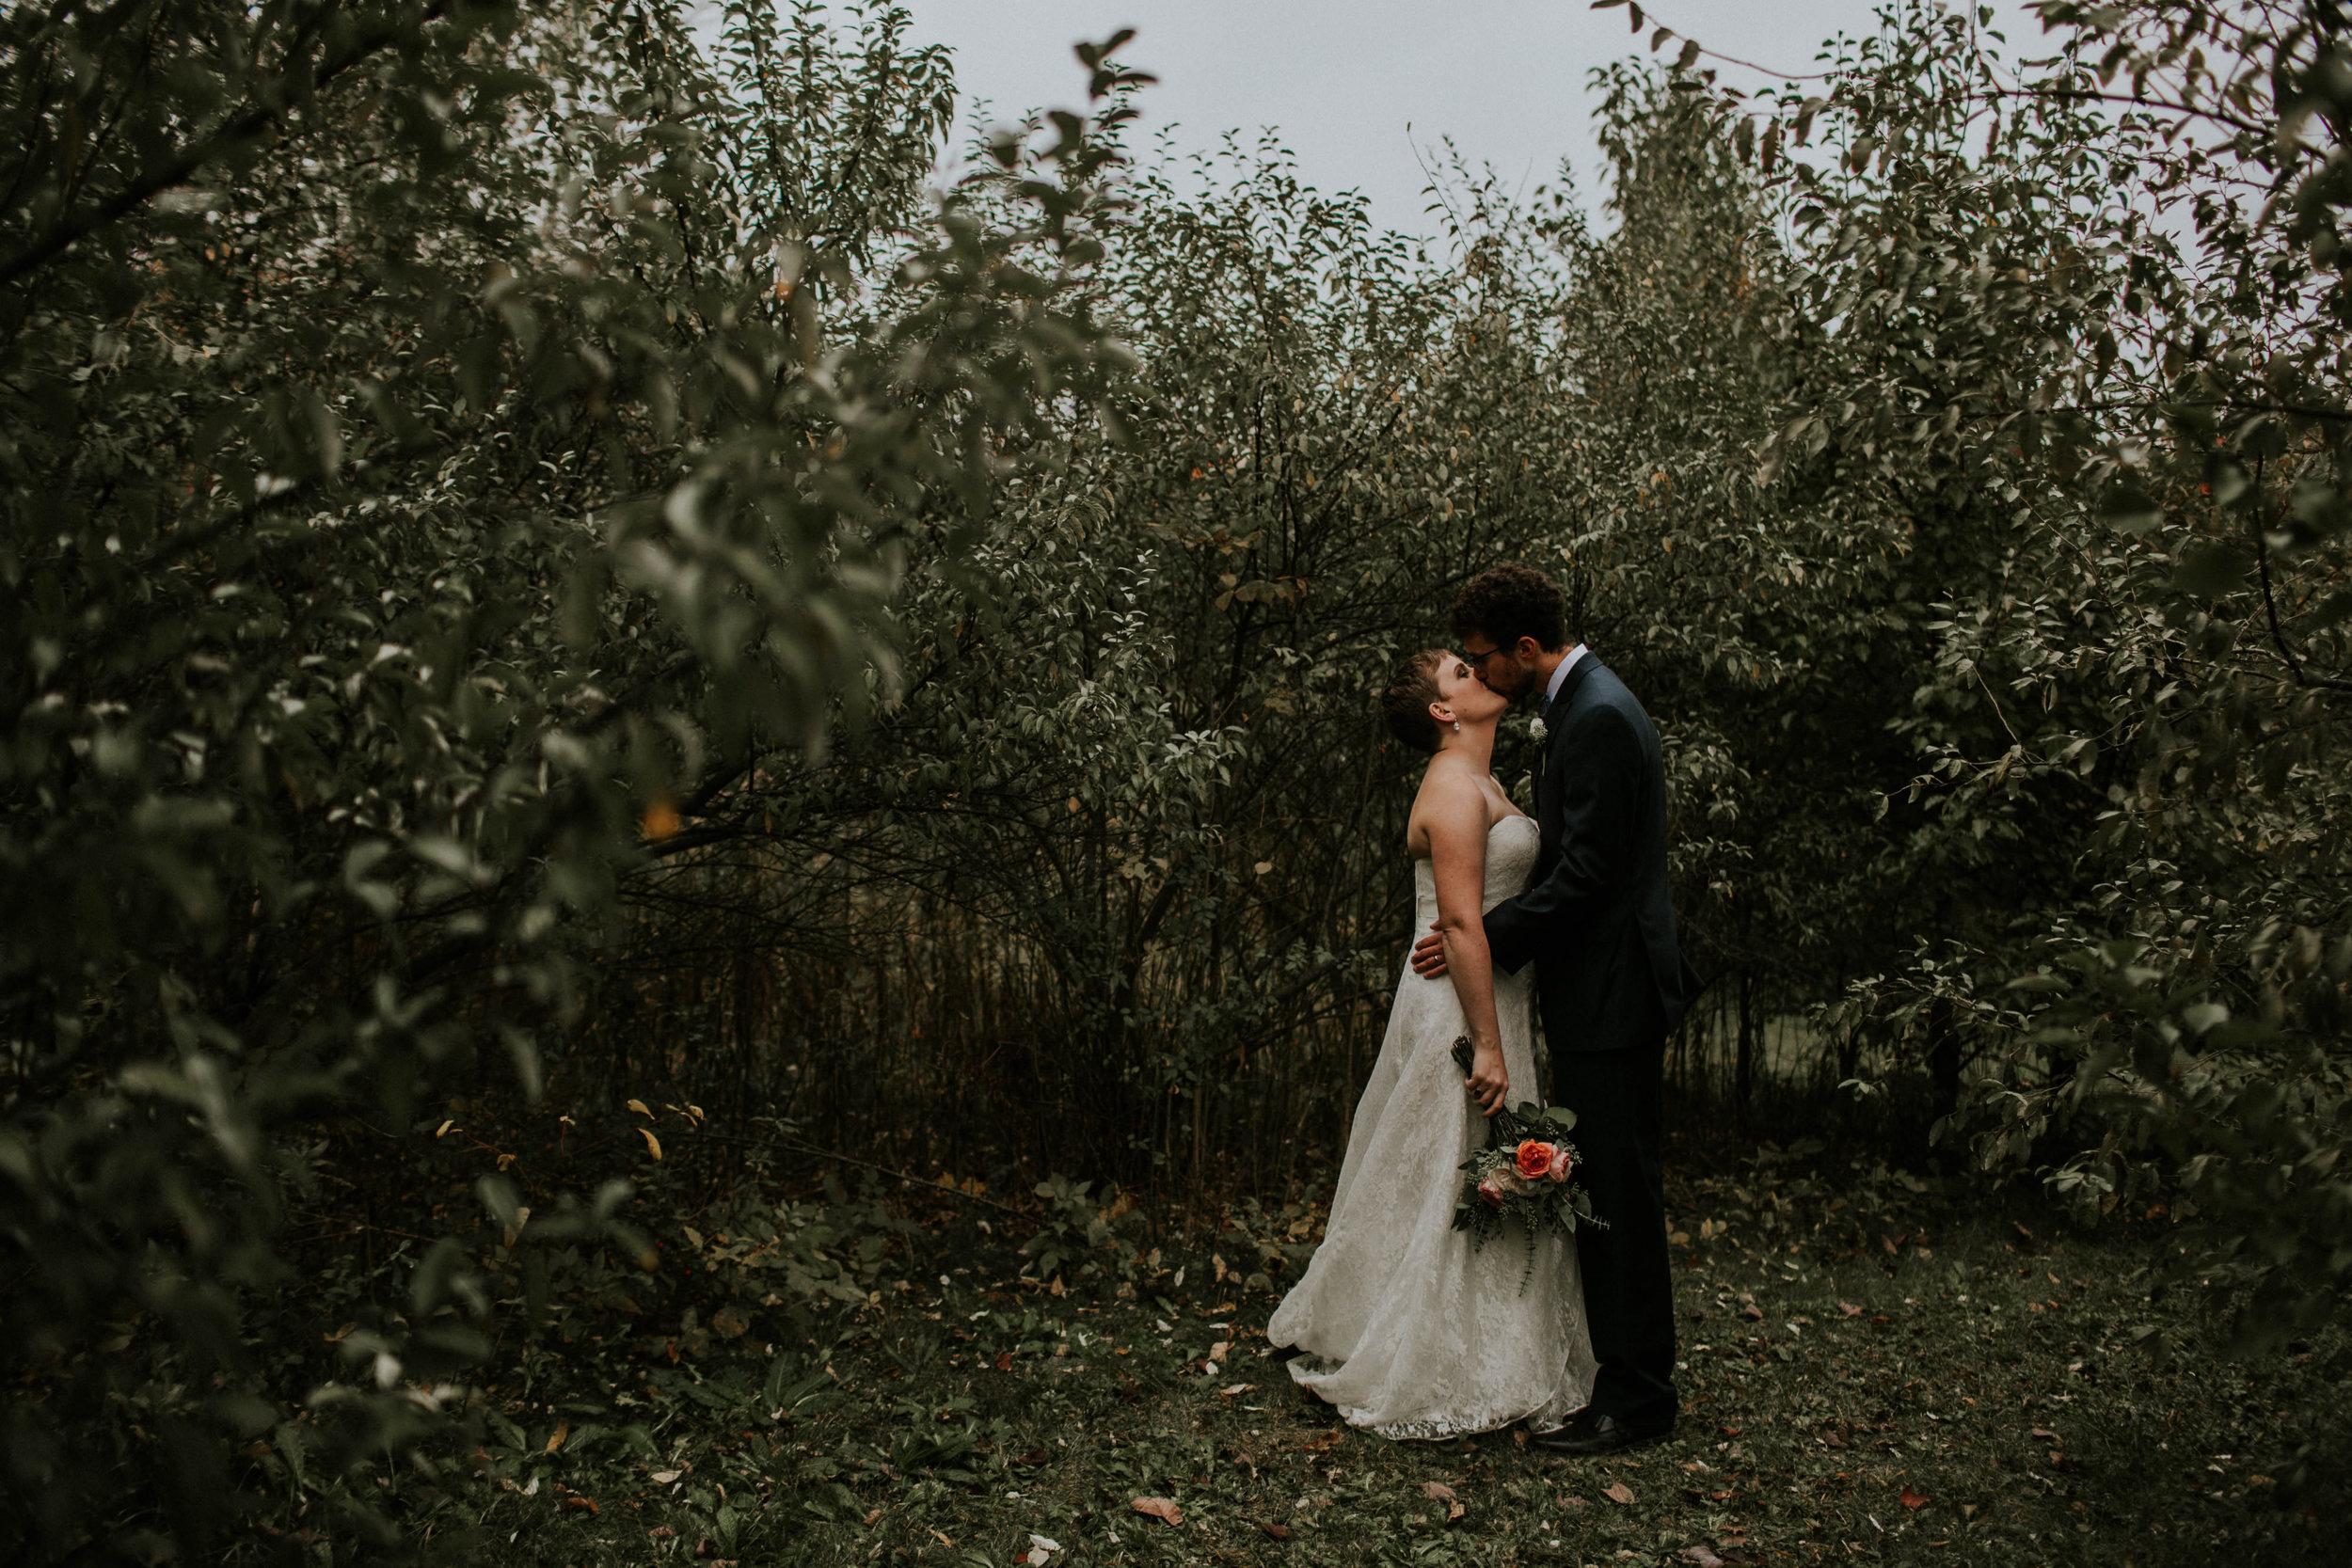 Columbus ohio wedding photographer grace e jones photography real fun joyful wedding38.jpg